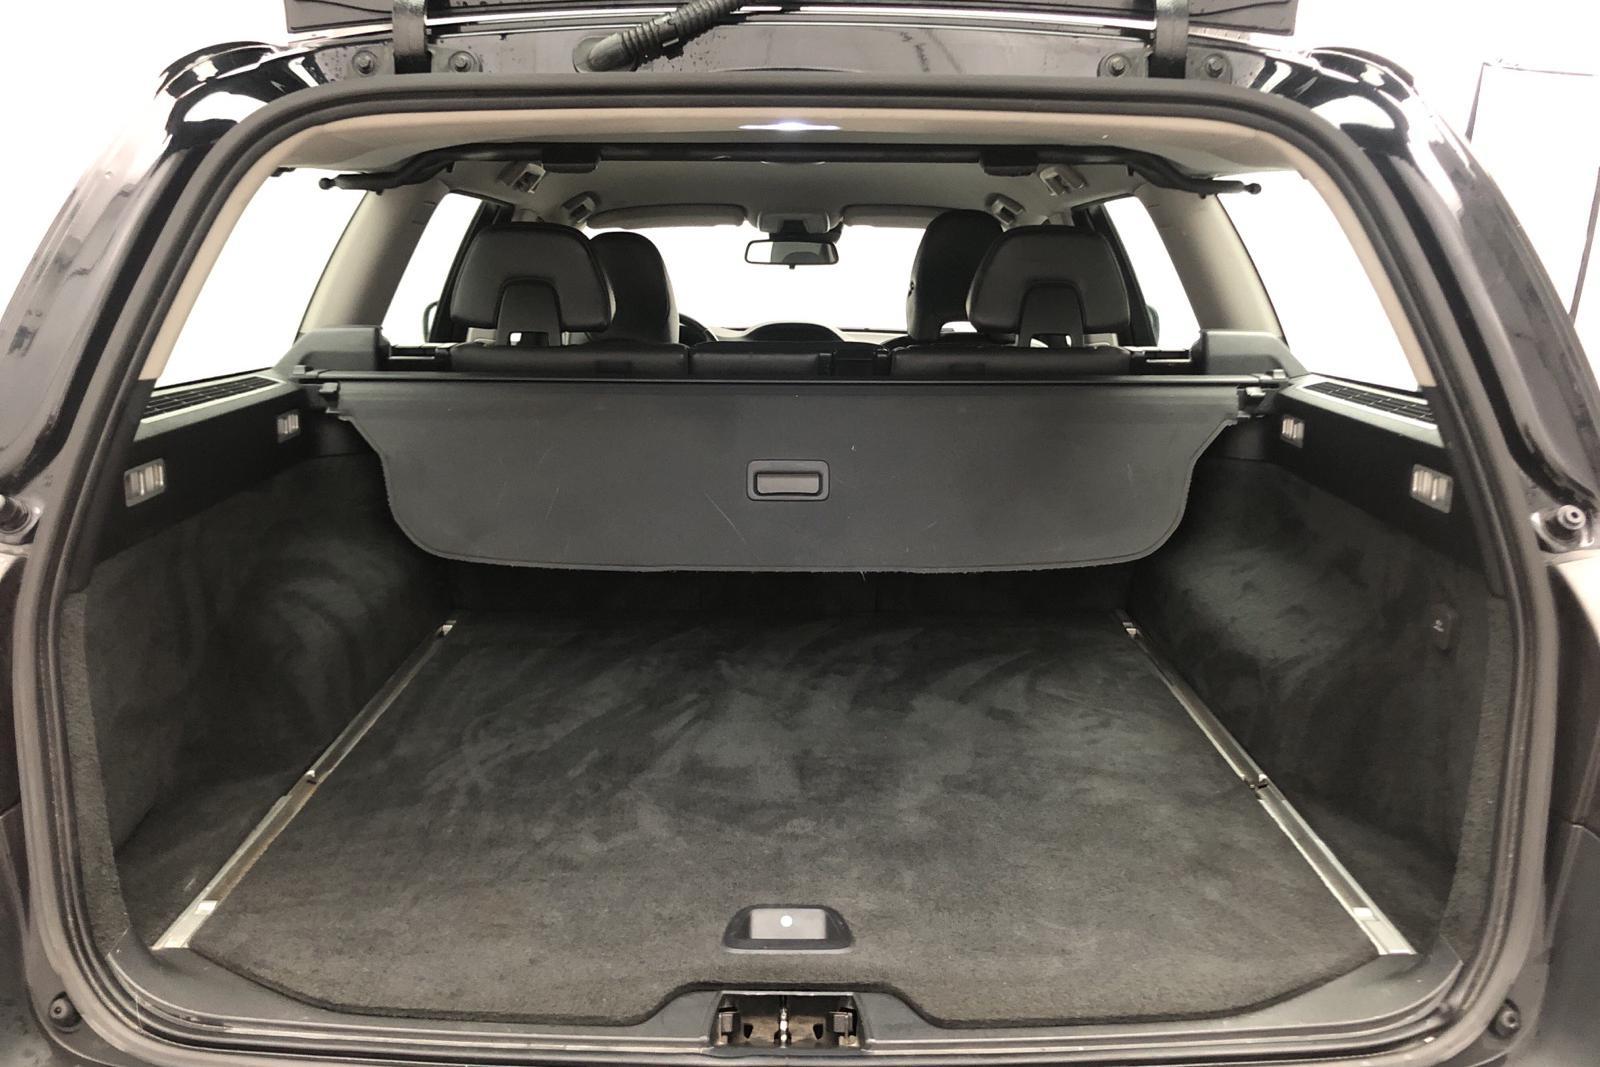 Volvo XC70 II D4 AWD (163hk) - 250 500 km - Automatic - black - 2013